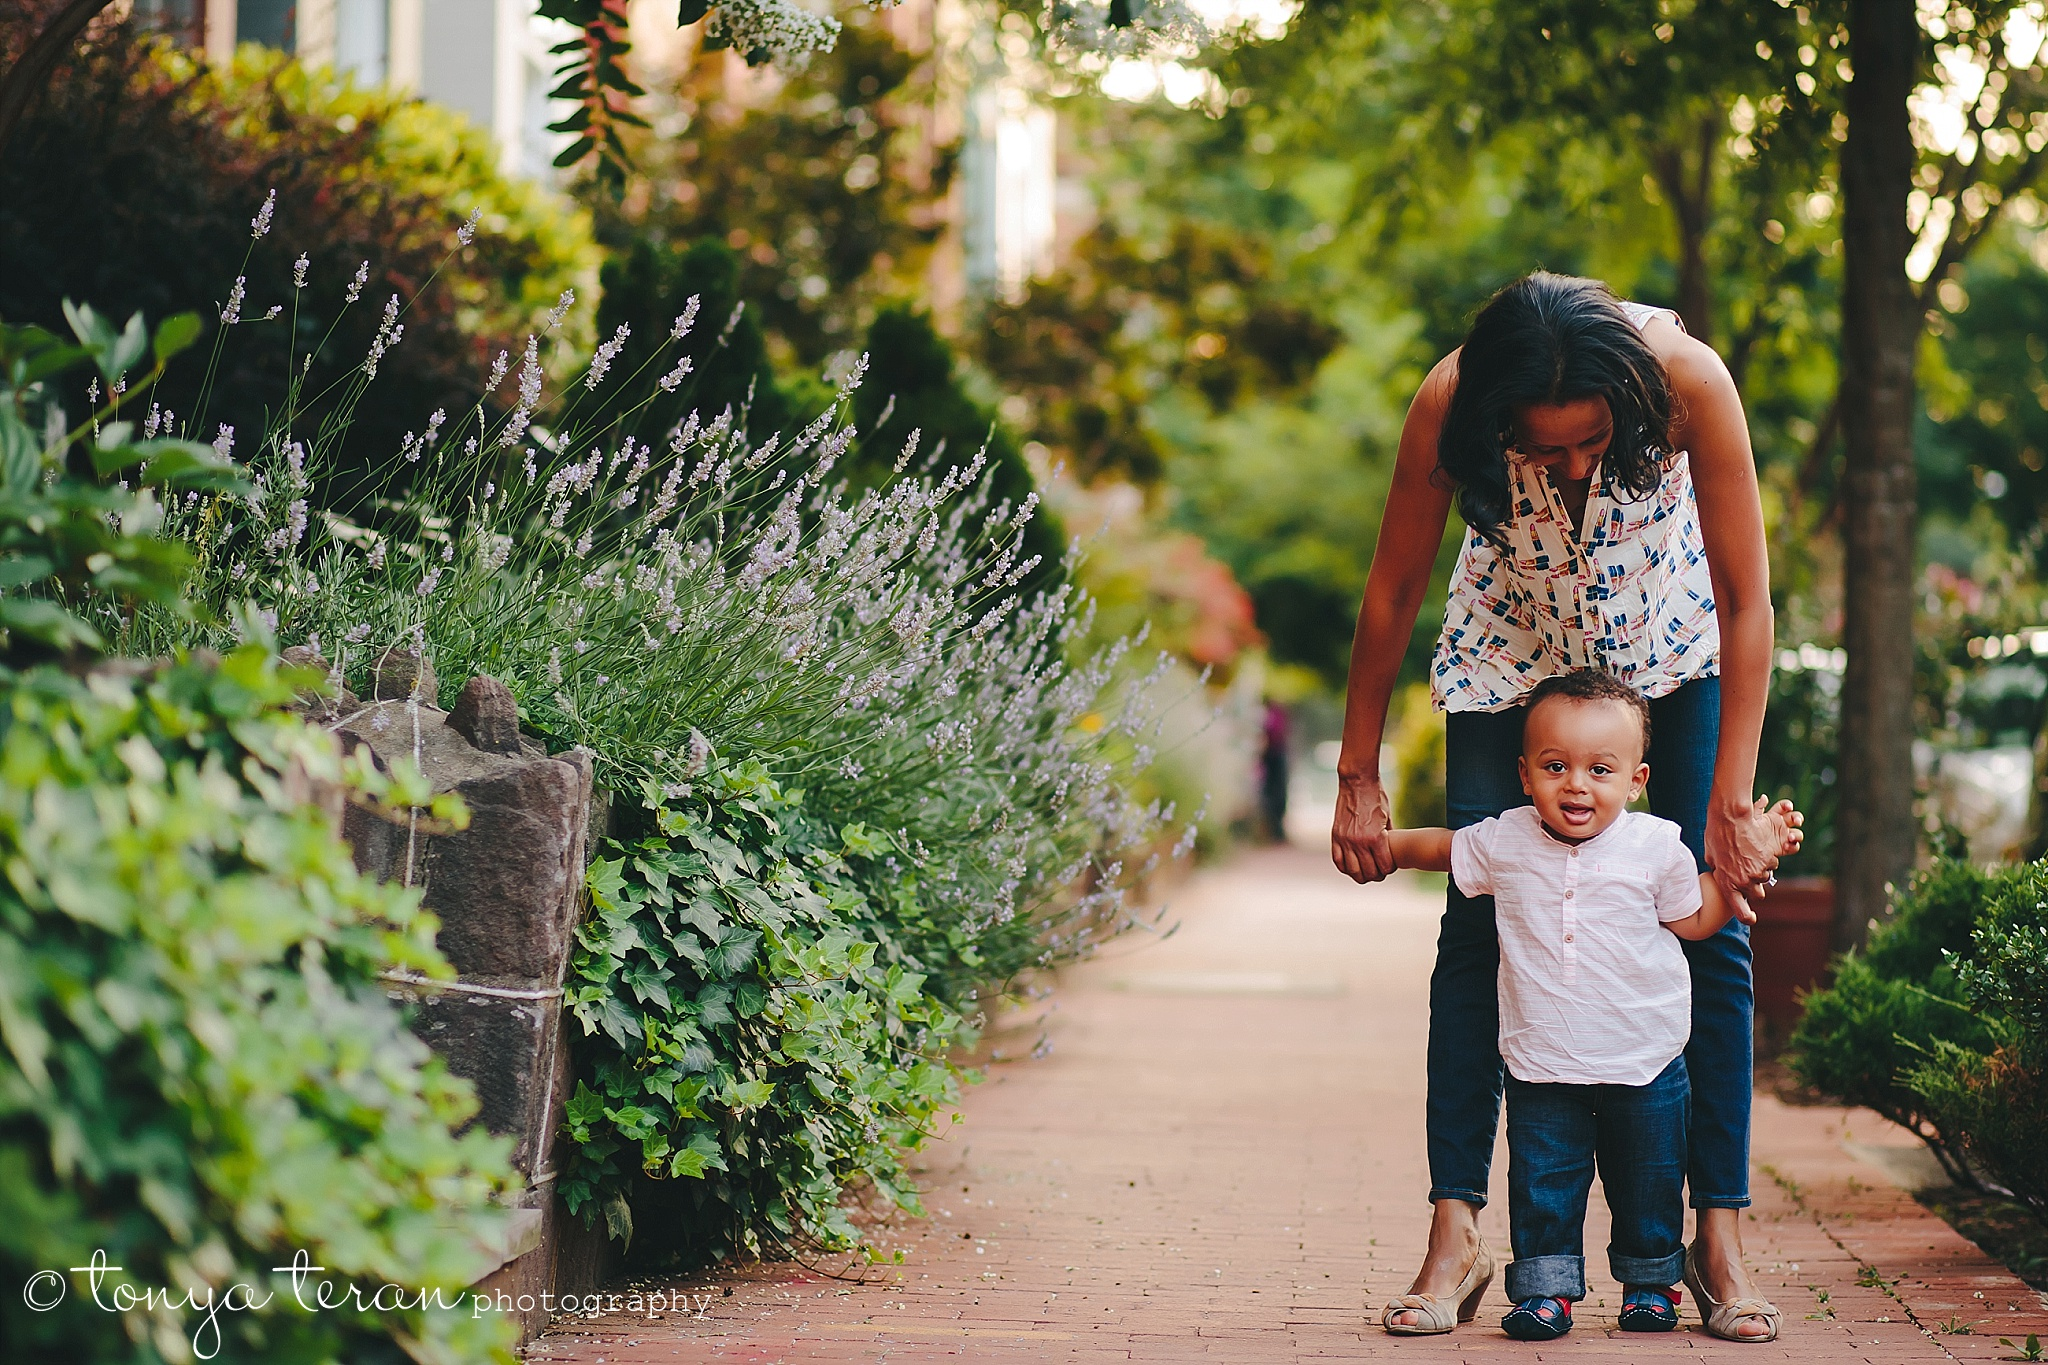 1st birthday Lifestyle Photo Session | Tonya Teran Photography, Washington, DC Newborn, Baby, and Family Photographer